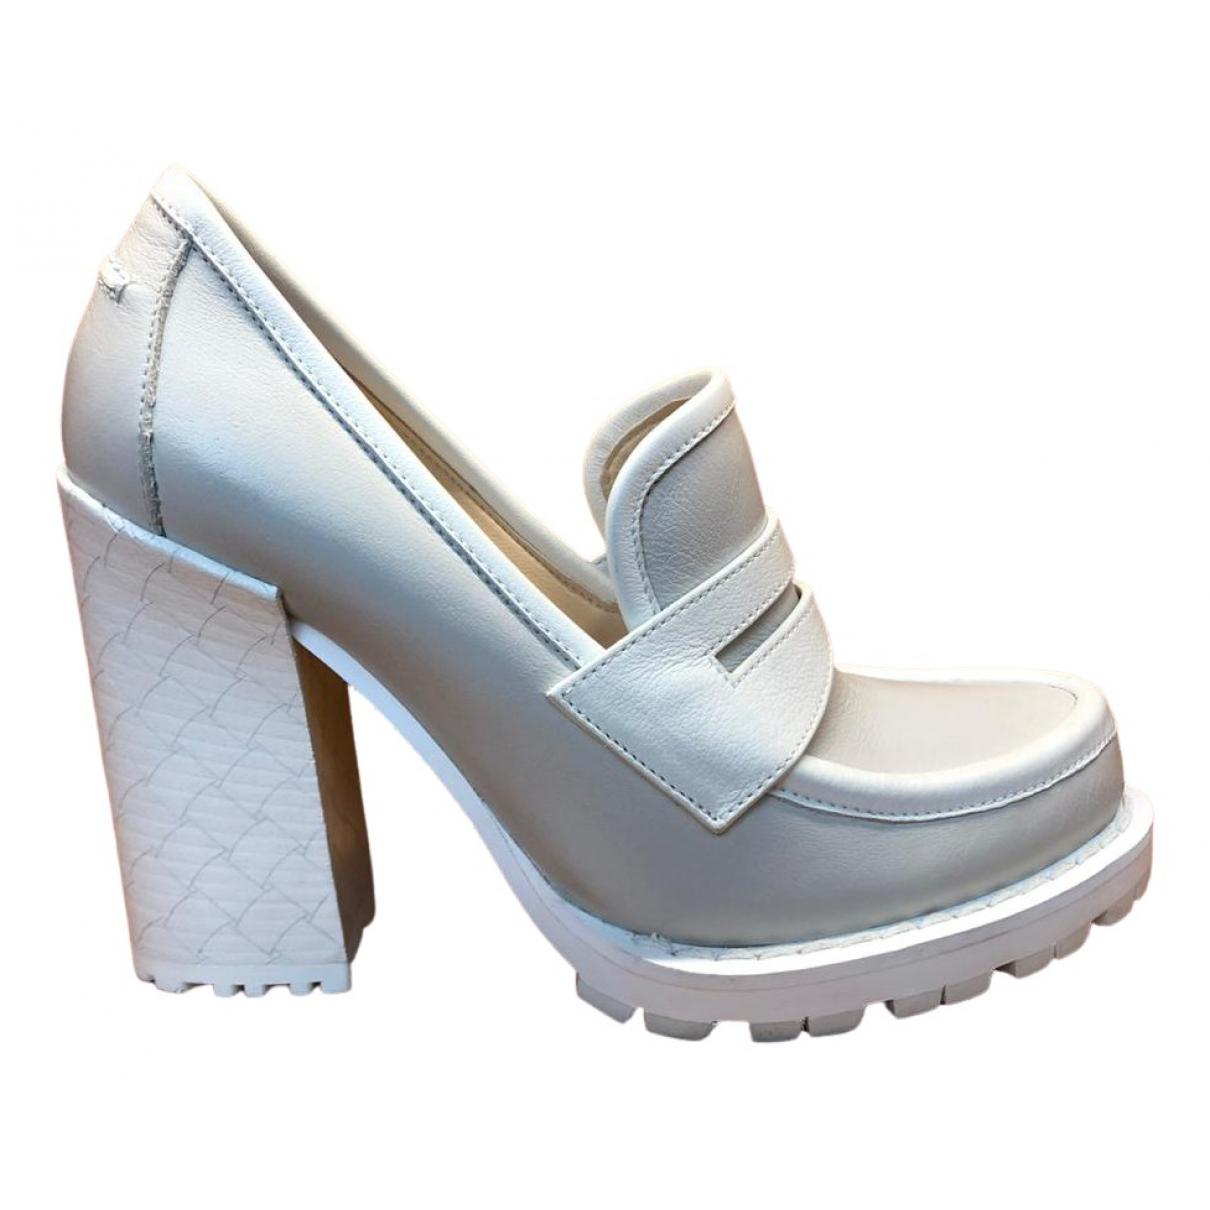 Bottega Veneta \N White Leather Heels for Women 36 EU